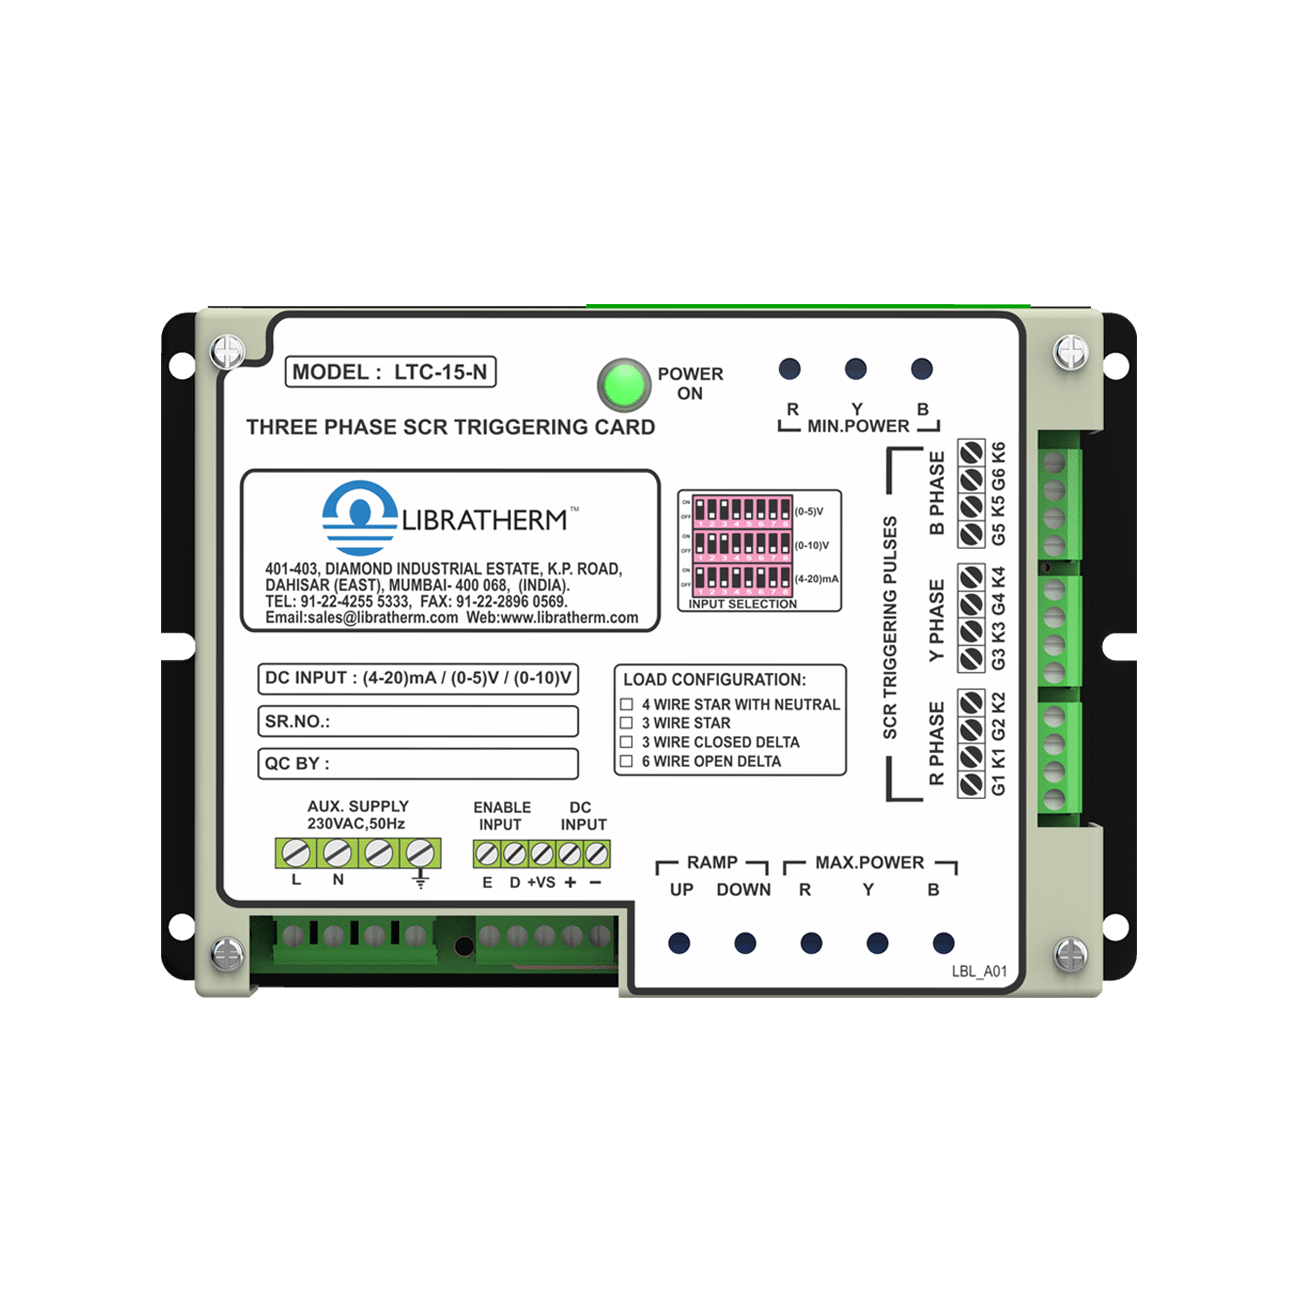 thyristor-triggering-card-ltc-15-front